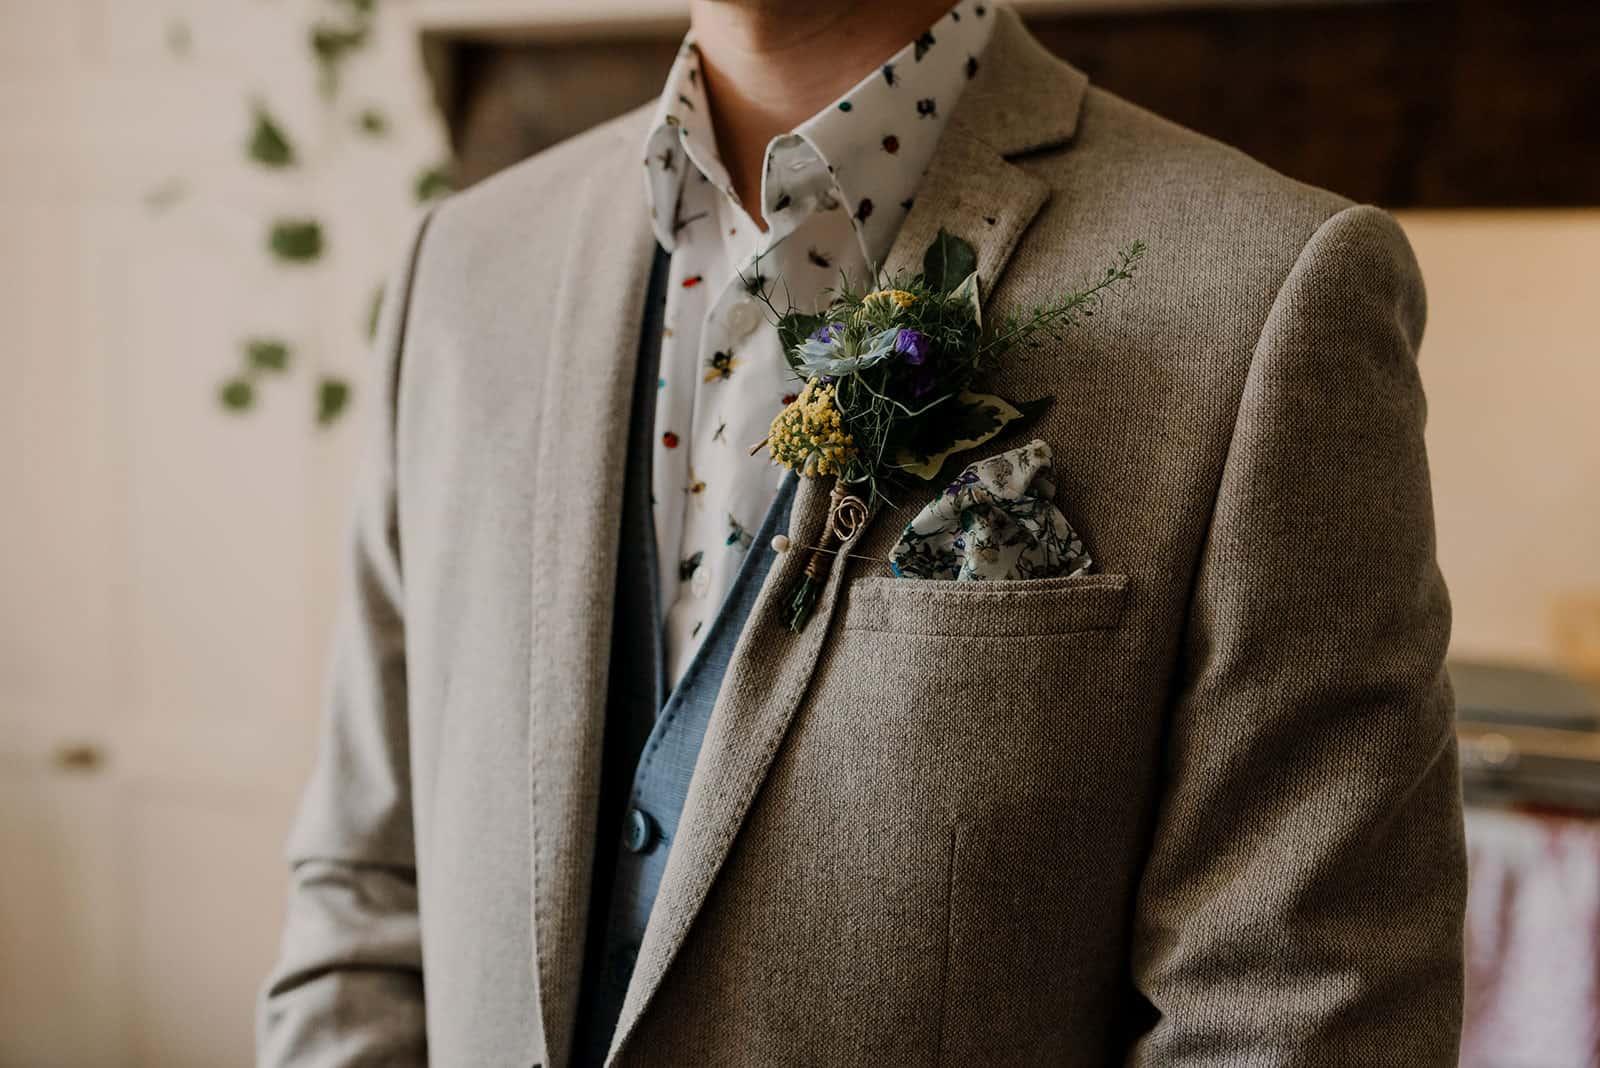 newdowns-farm-wedding-flowers-flower-shed-trebilcocks-tom-peter-0003